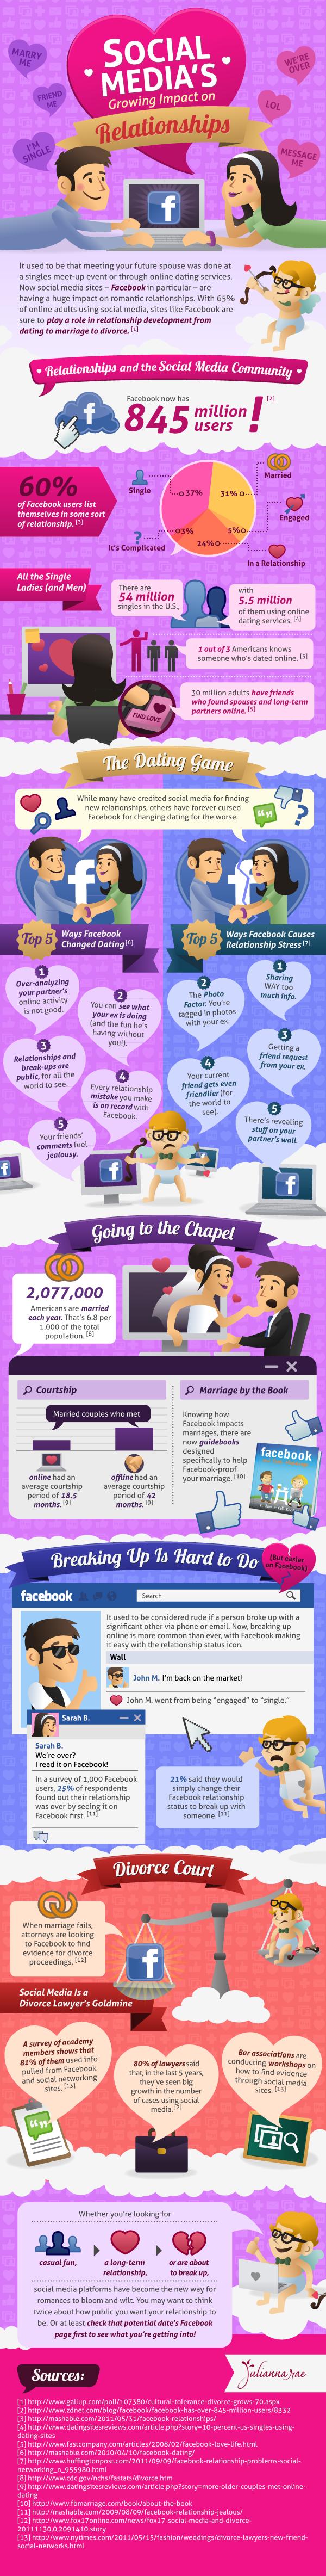 08 social-medias-impact-on-relationships1